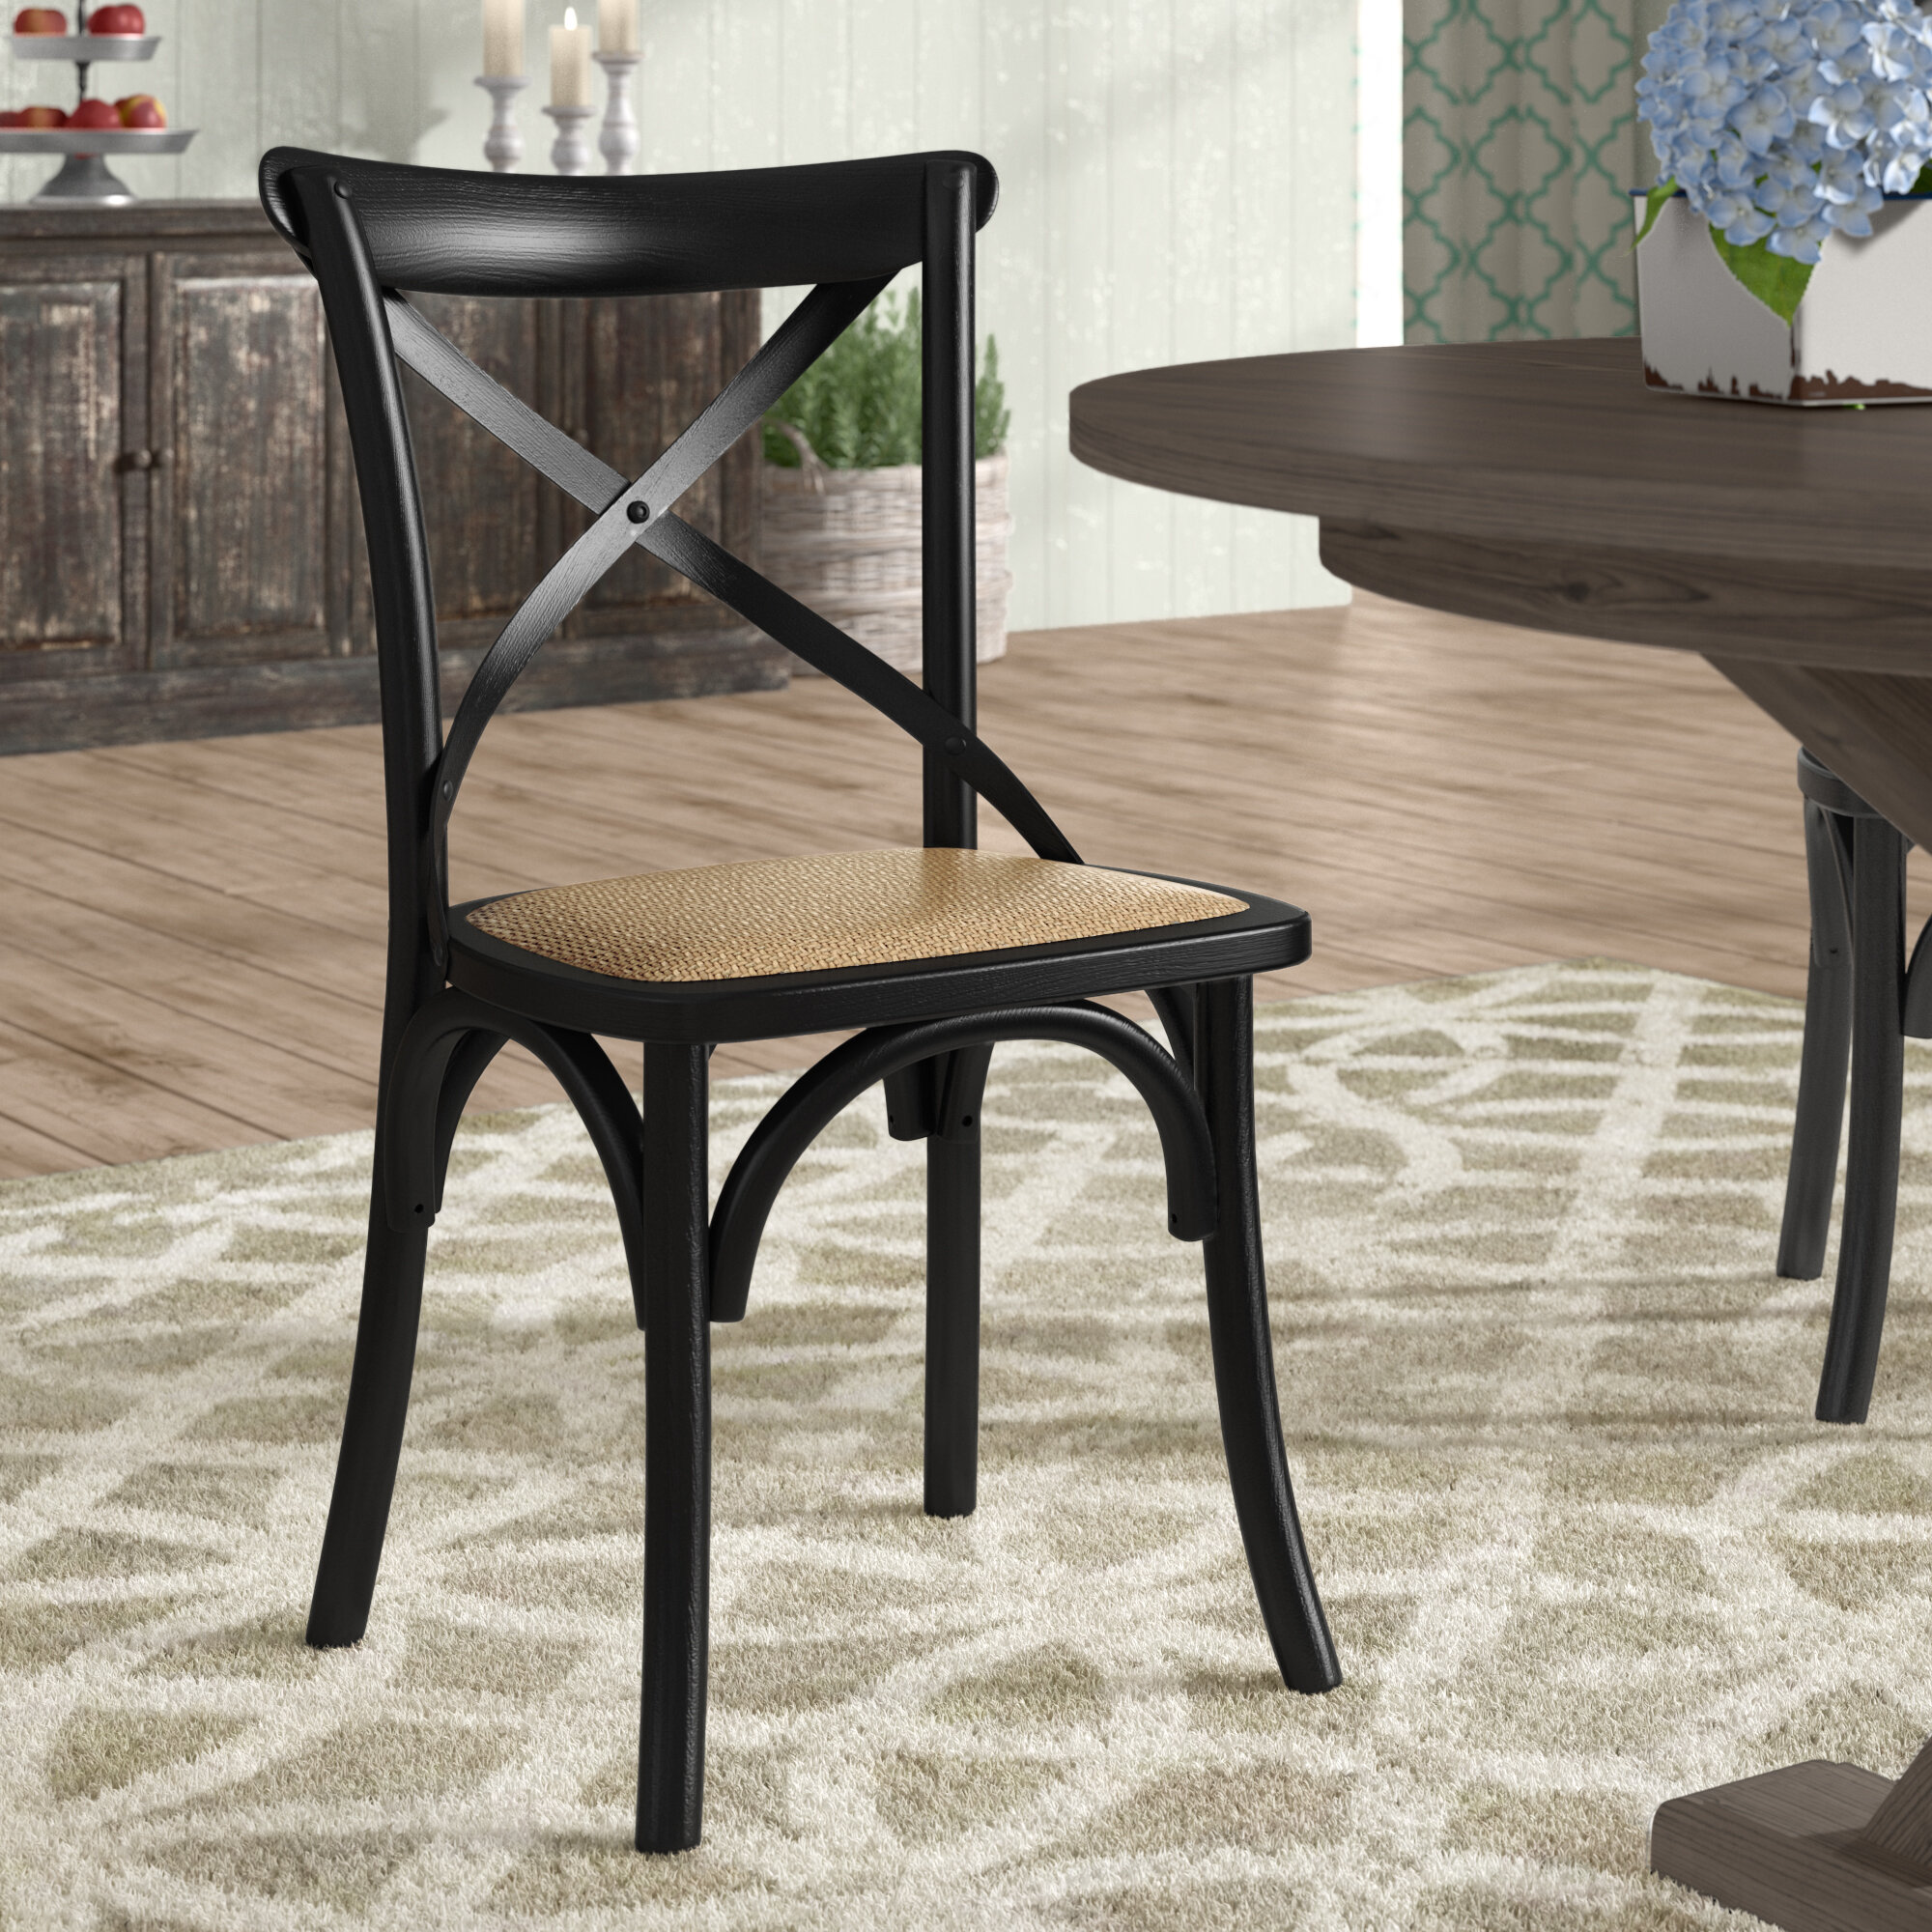 Laurel Foundry Modern Farmhouse Gage Solid Wood Dining Chair